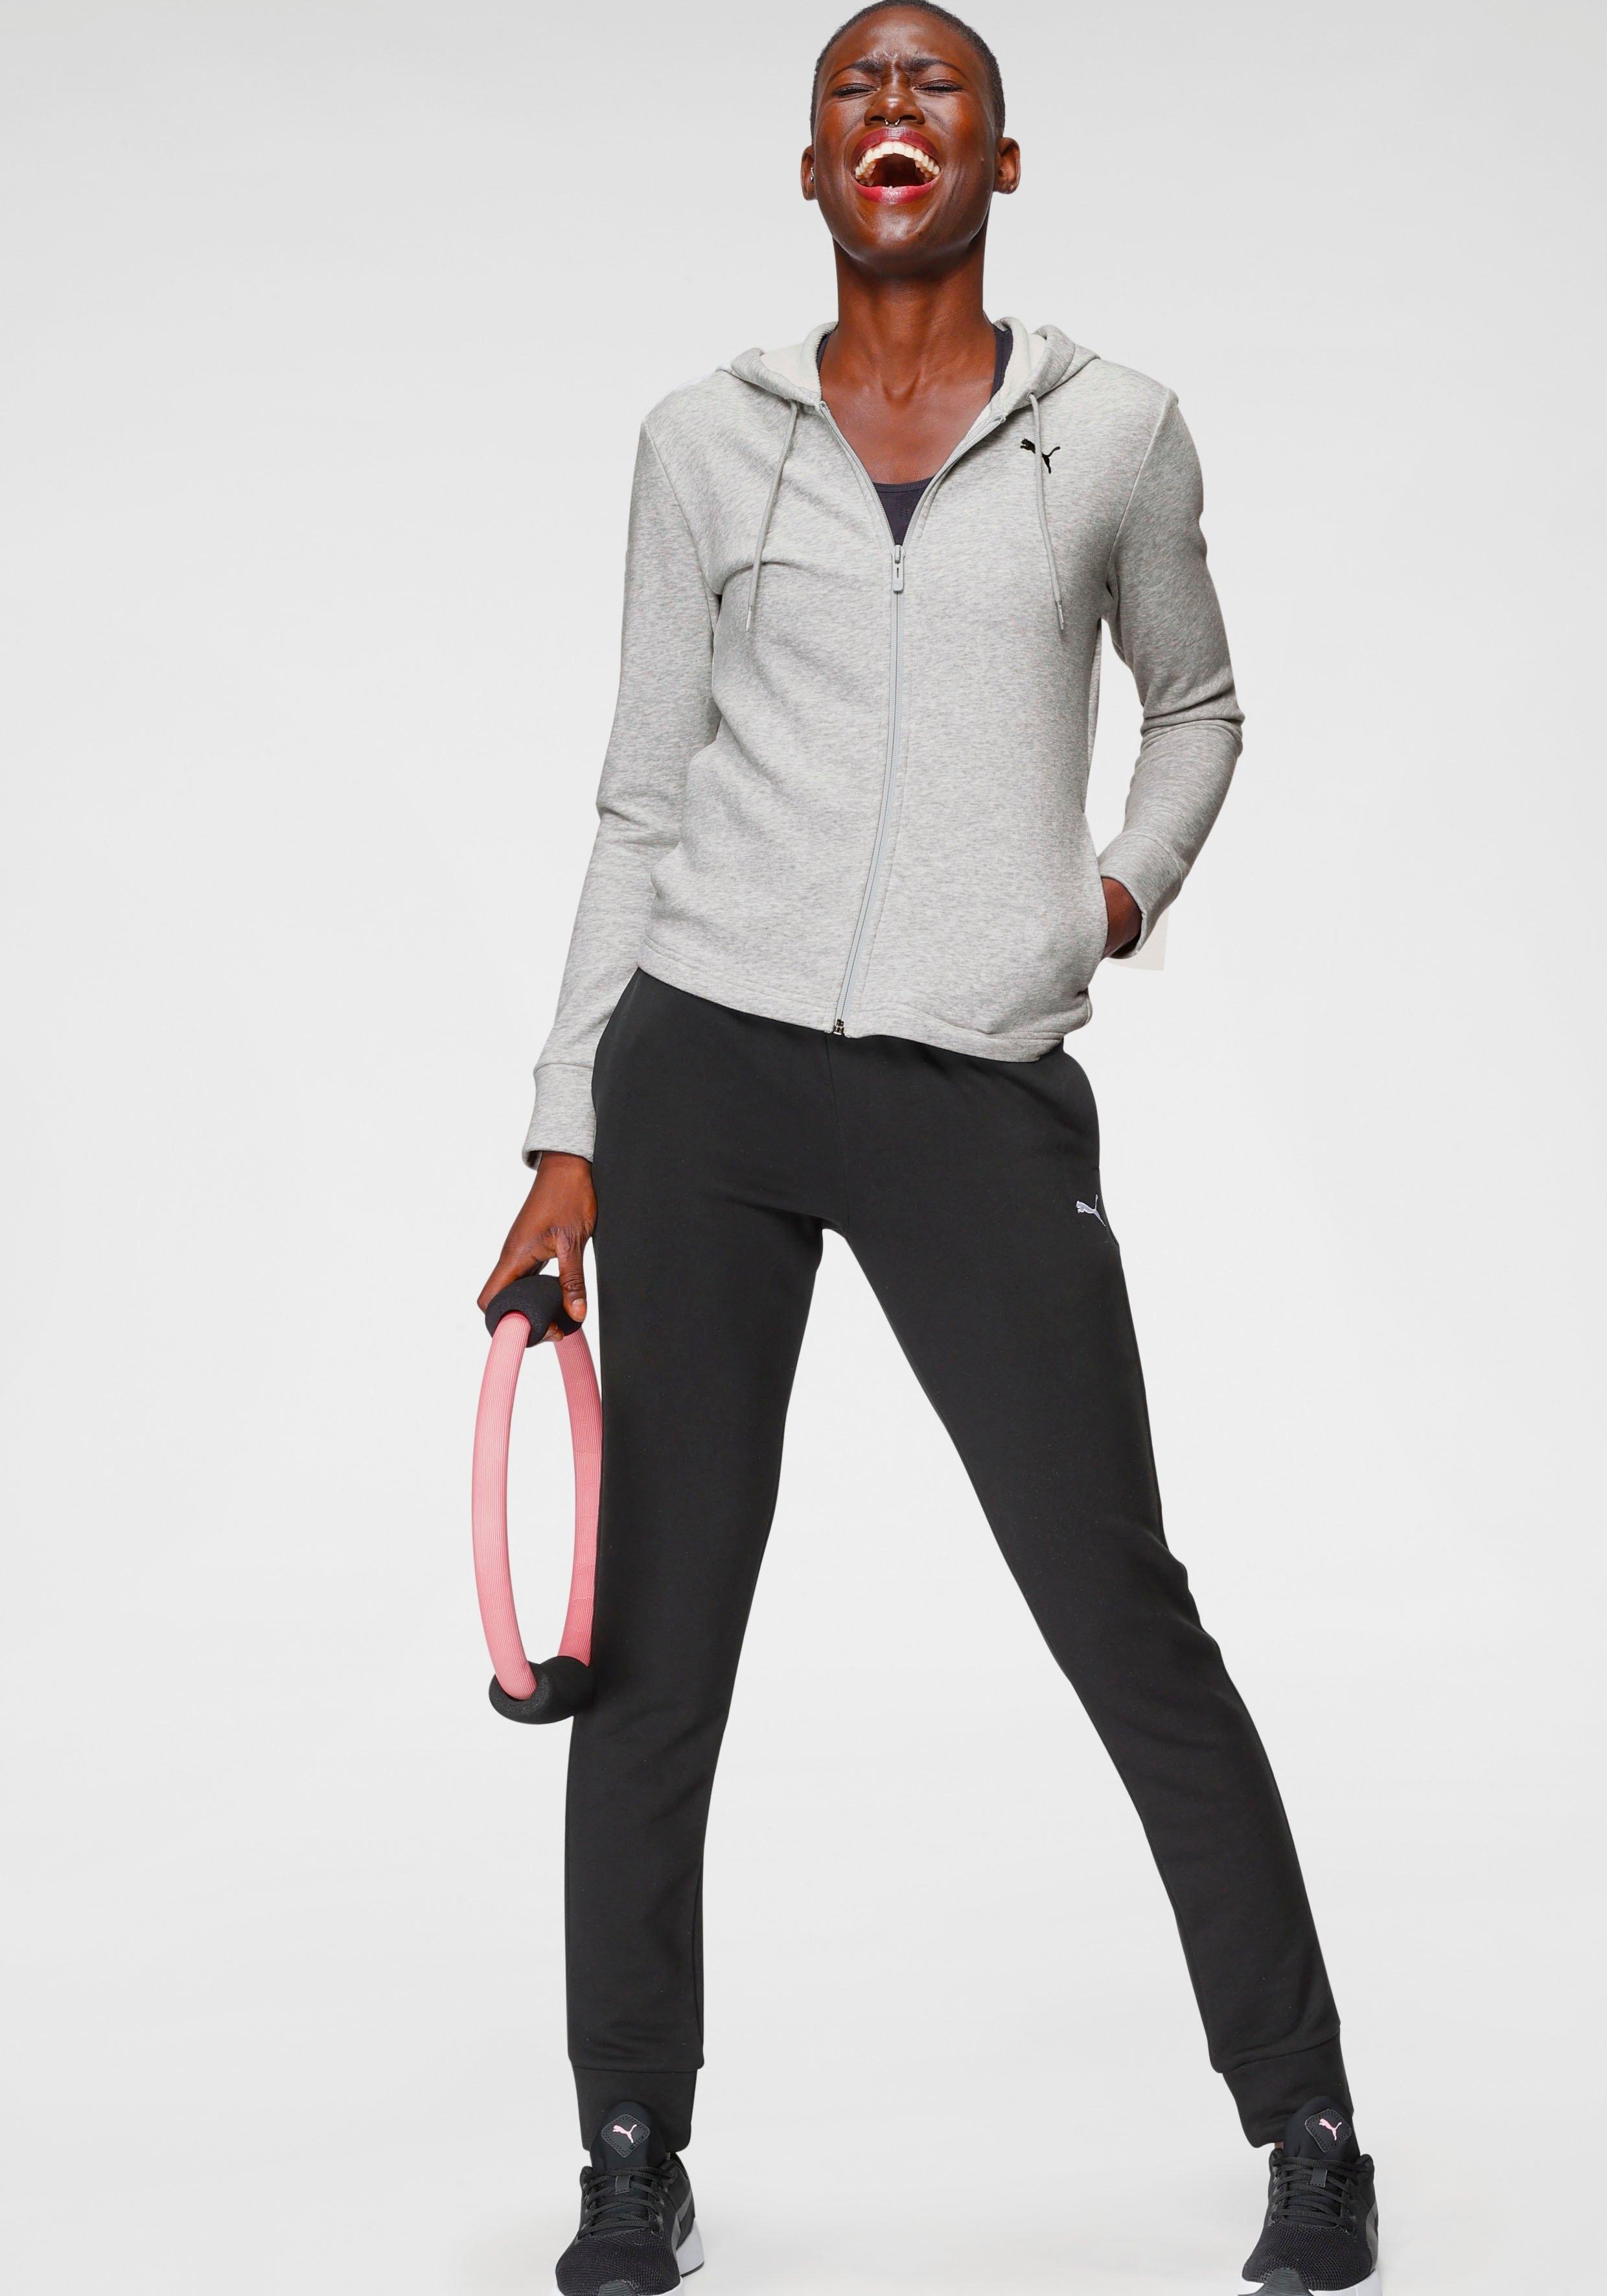 PUMA joggingpak Classic Hd. Sweat Suit TR (set, 2-delig) bij OTTO online kopen